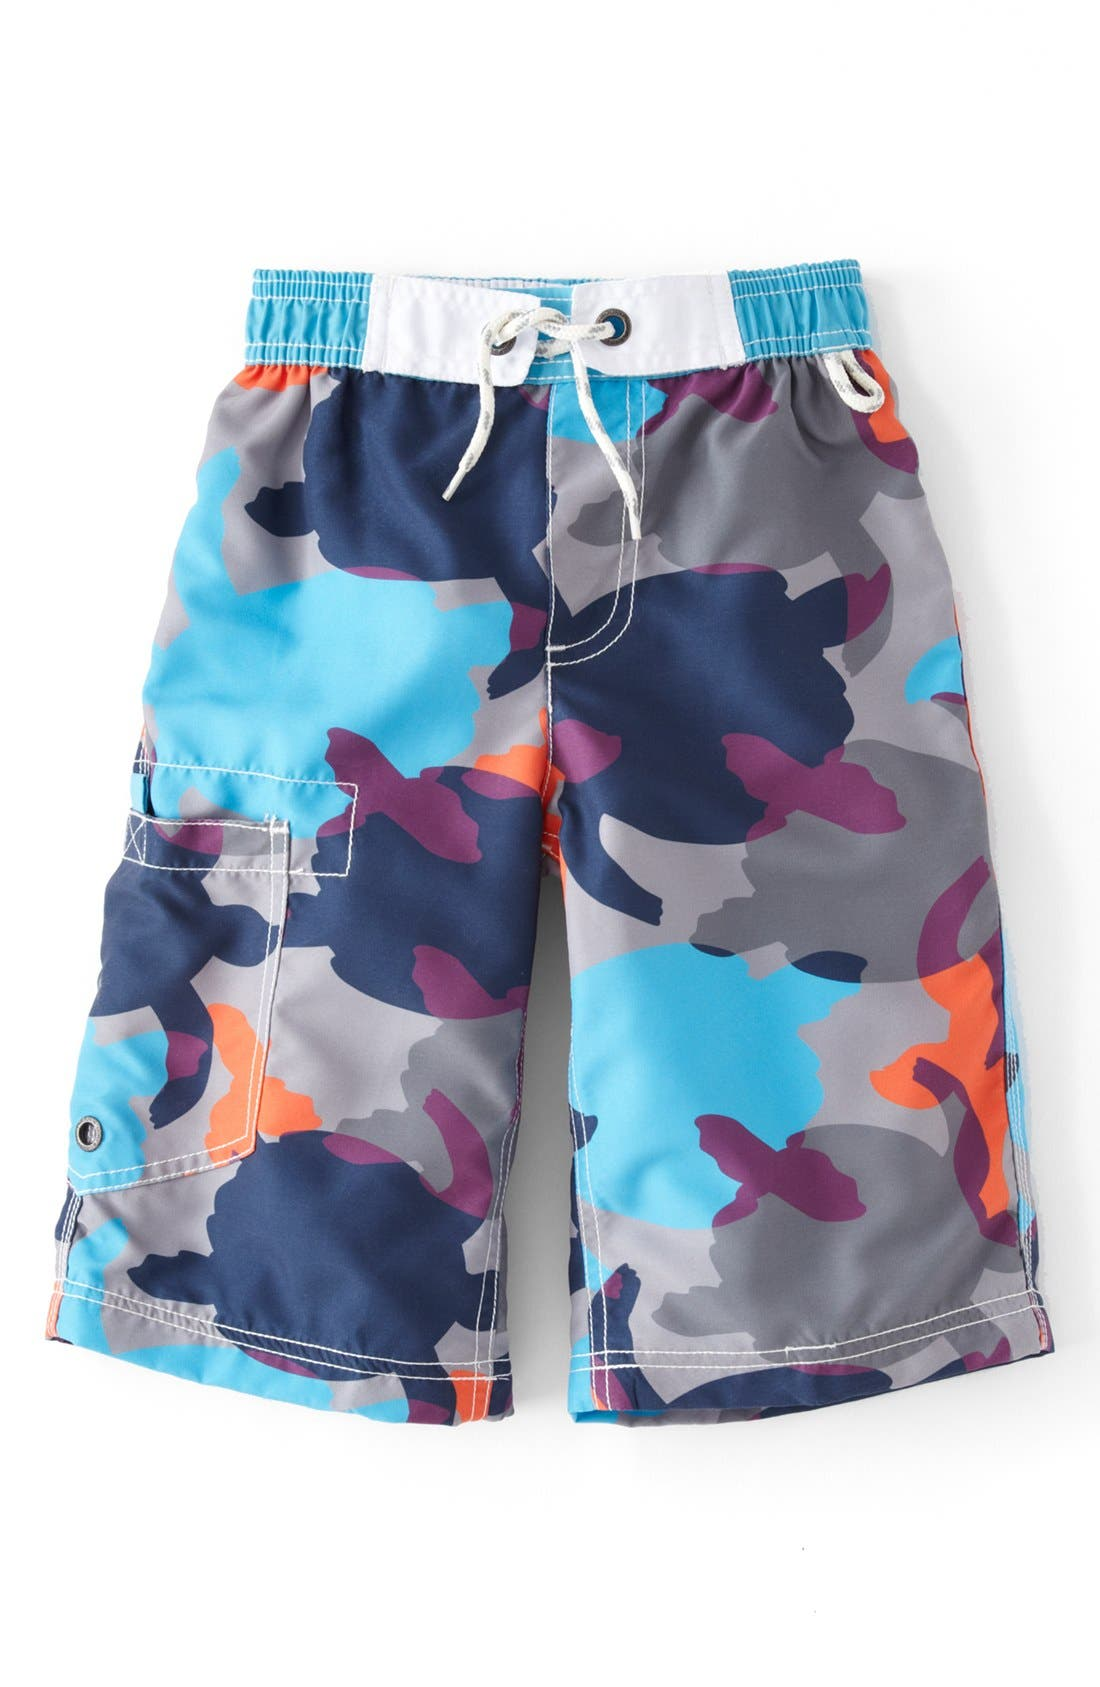 Main Image - Mini Boden 'Surf' Shorts (Toddler Boys, Little Boys & Big Boys)